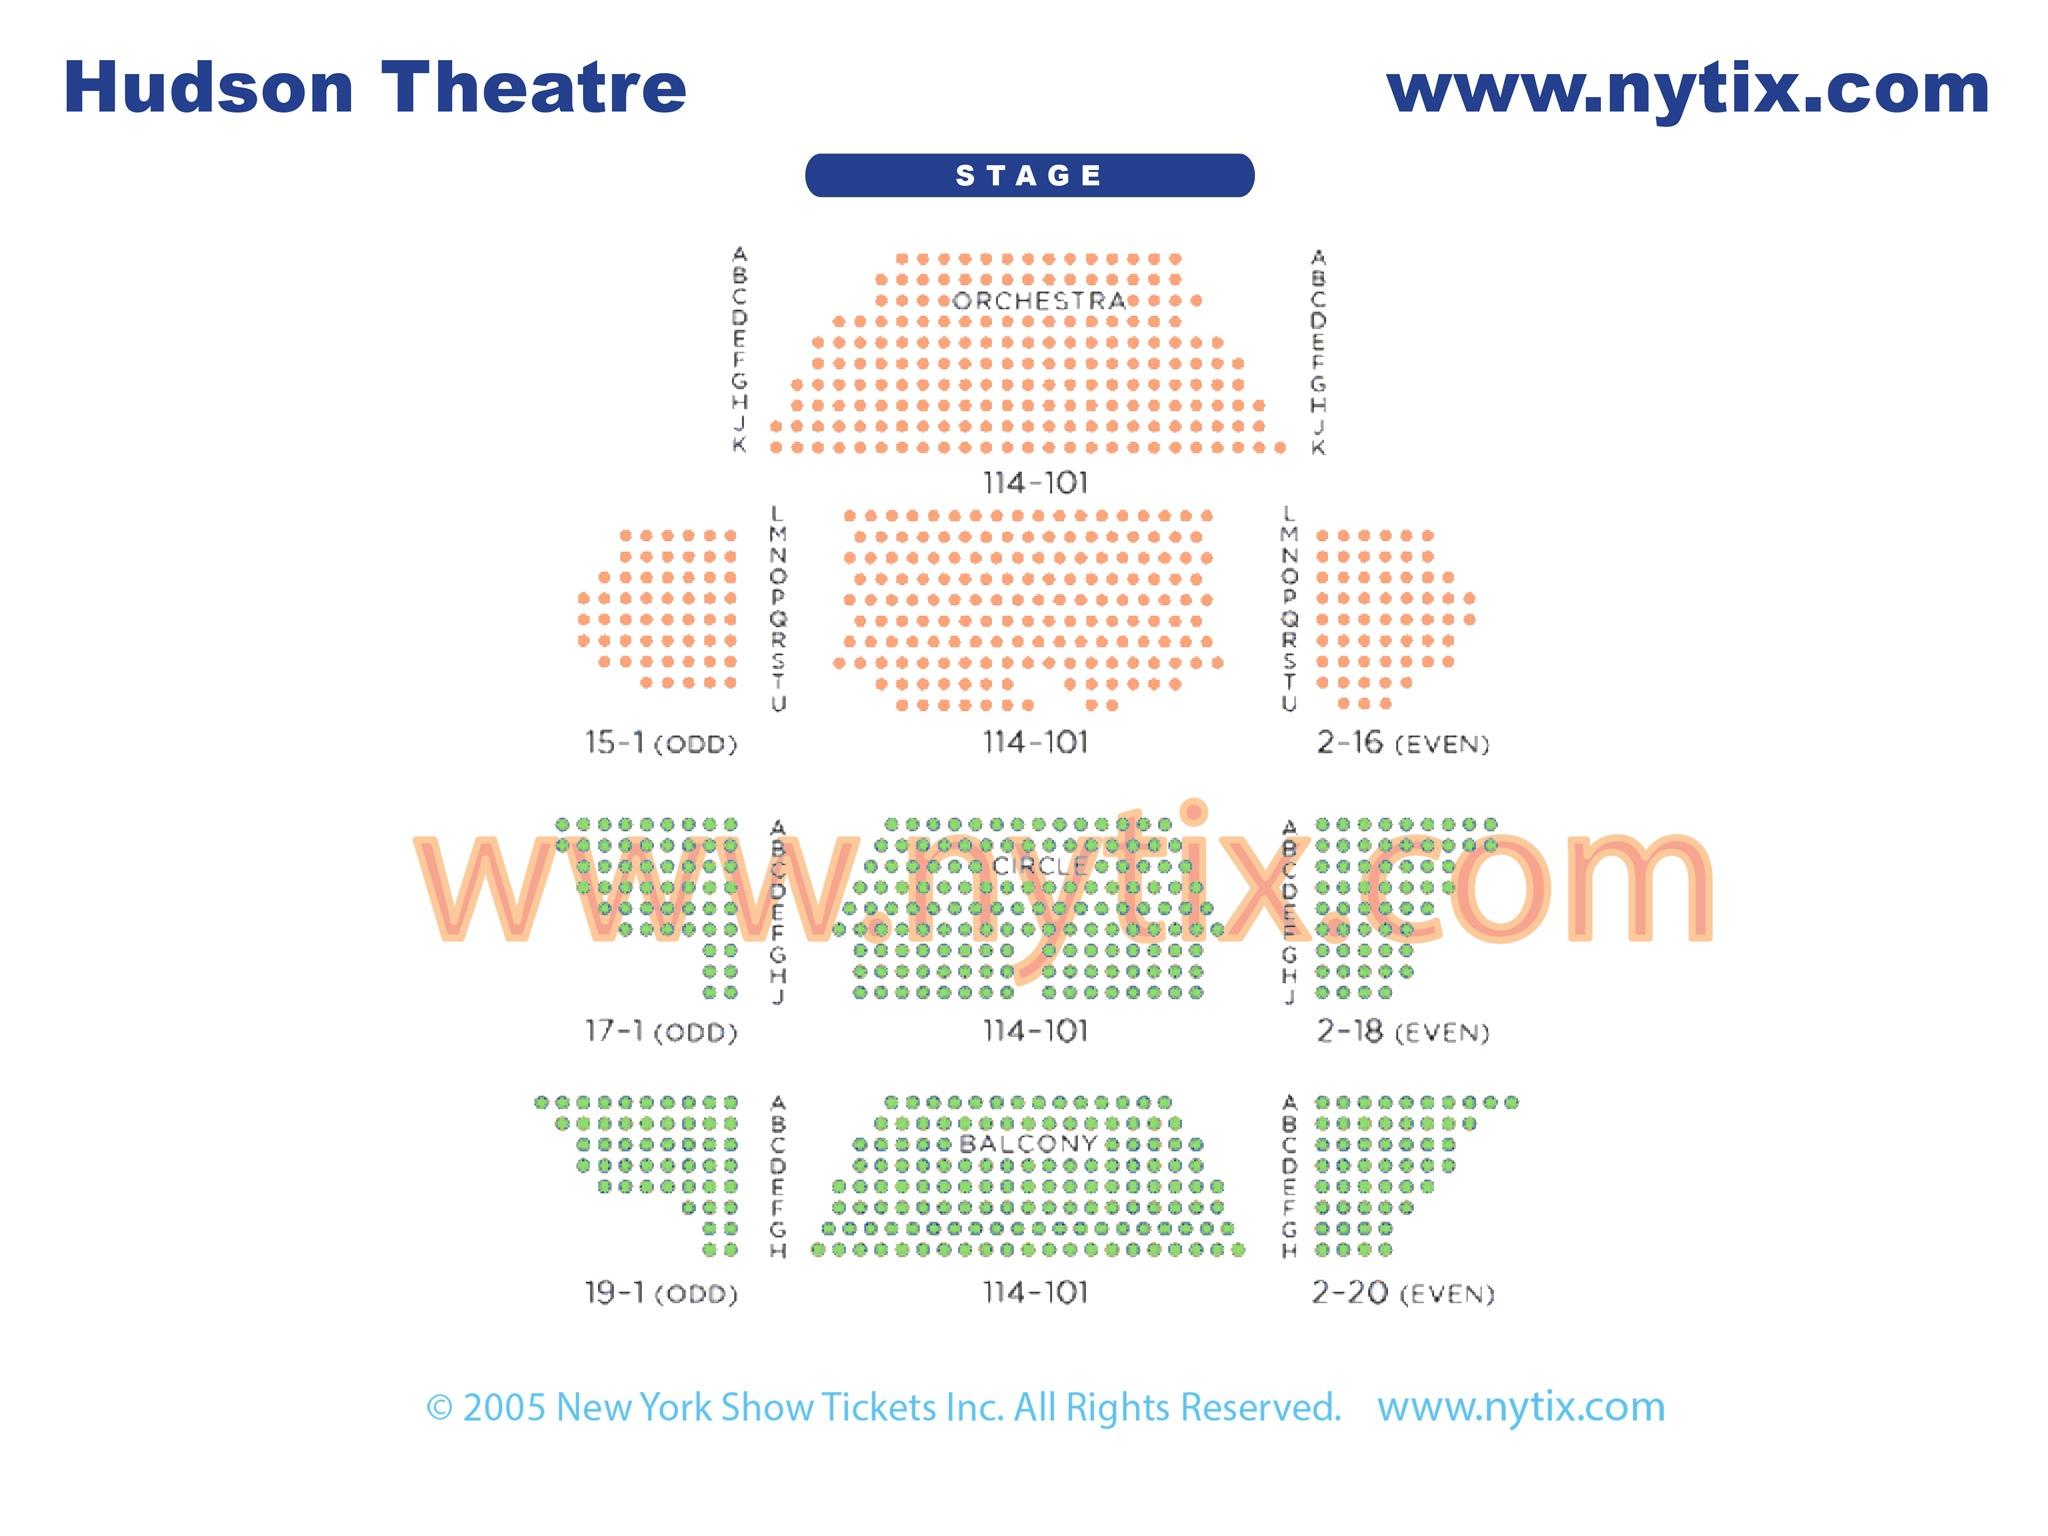 Hudson Theatre Seating Chart